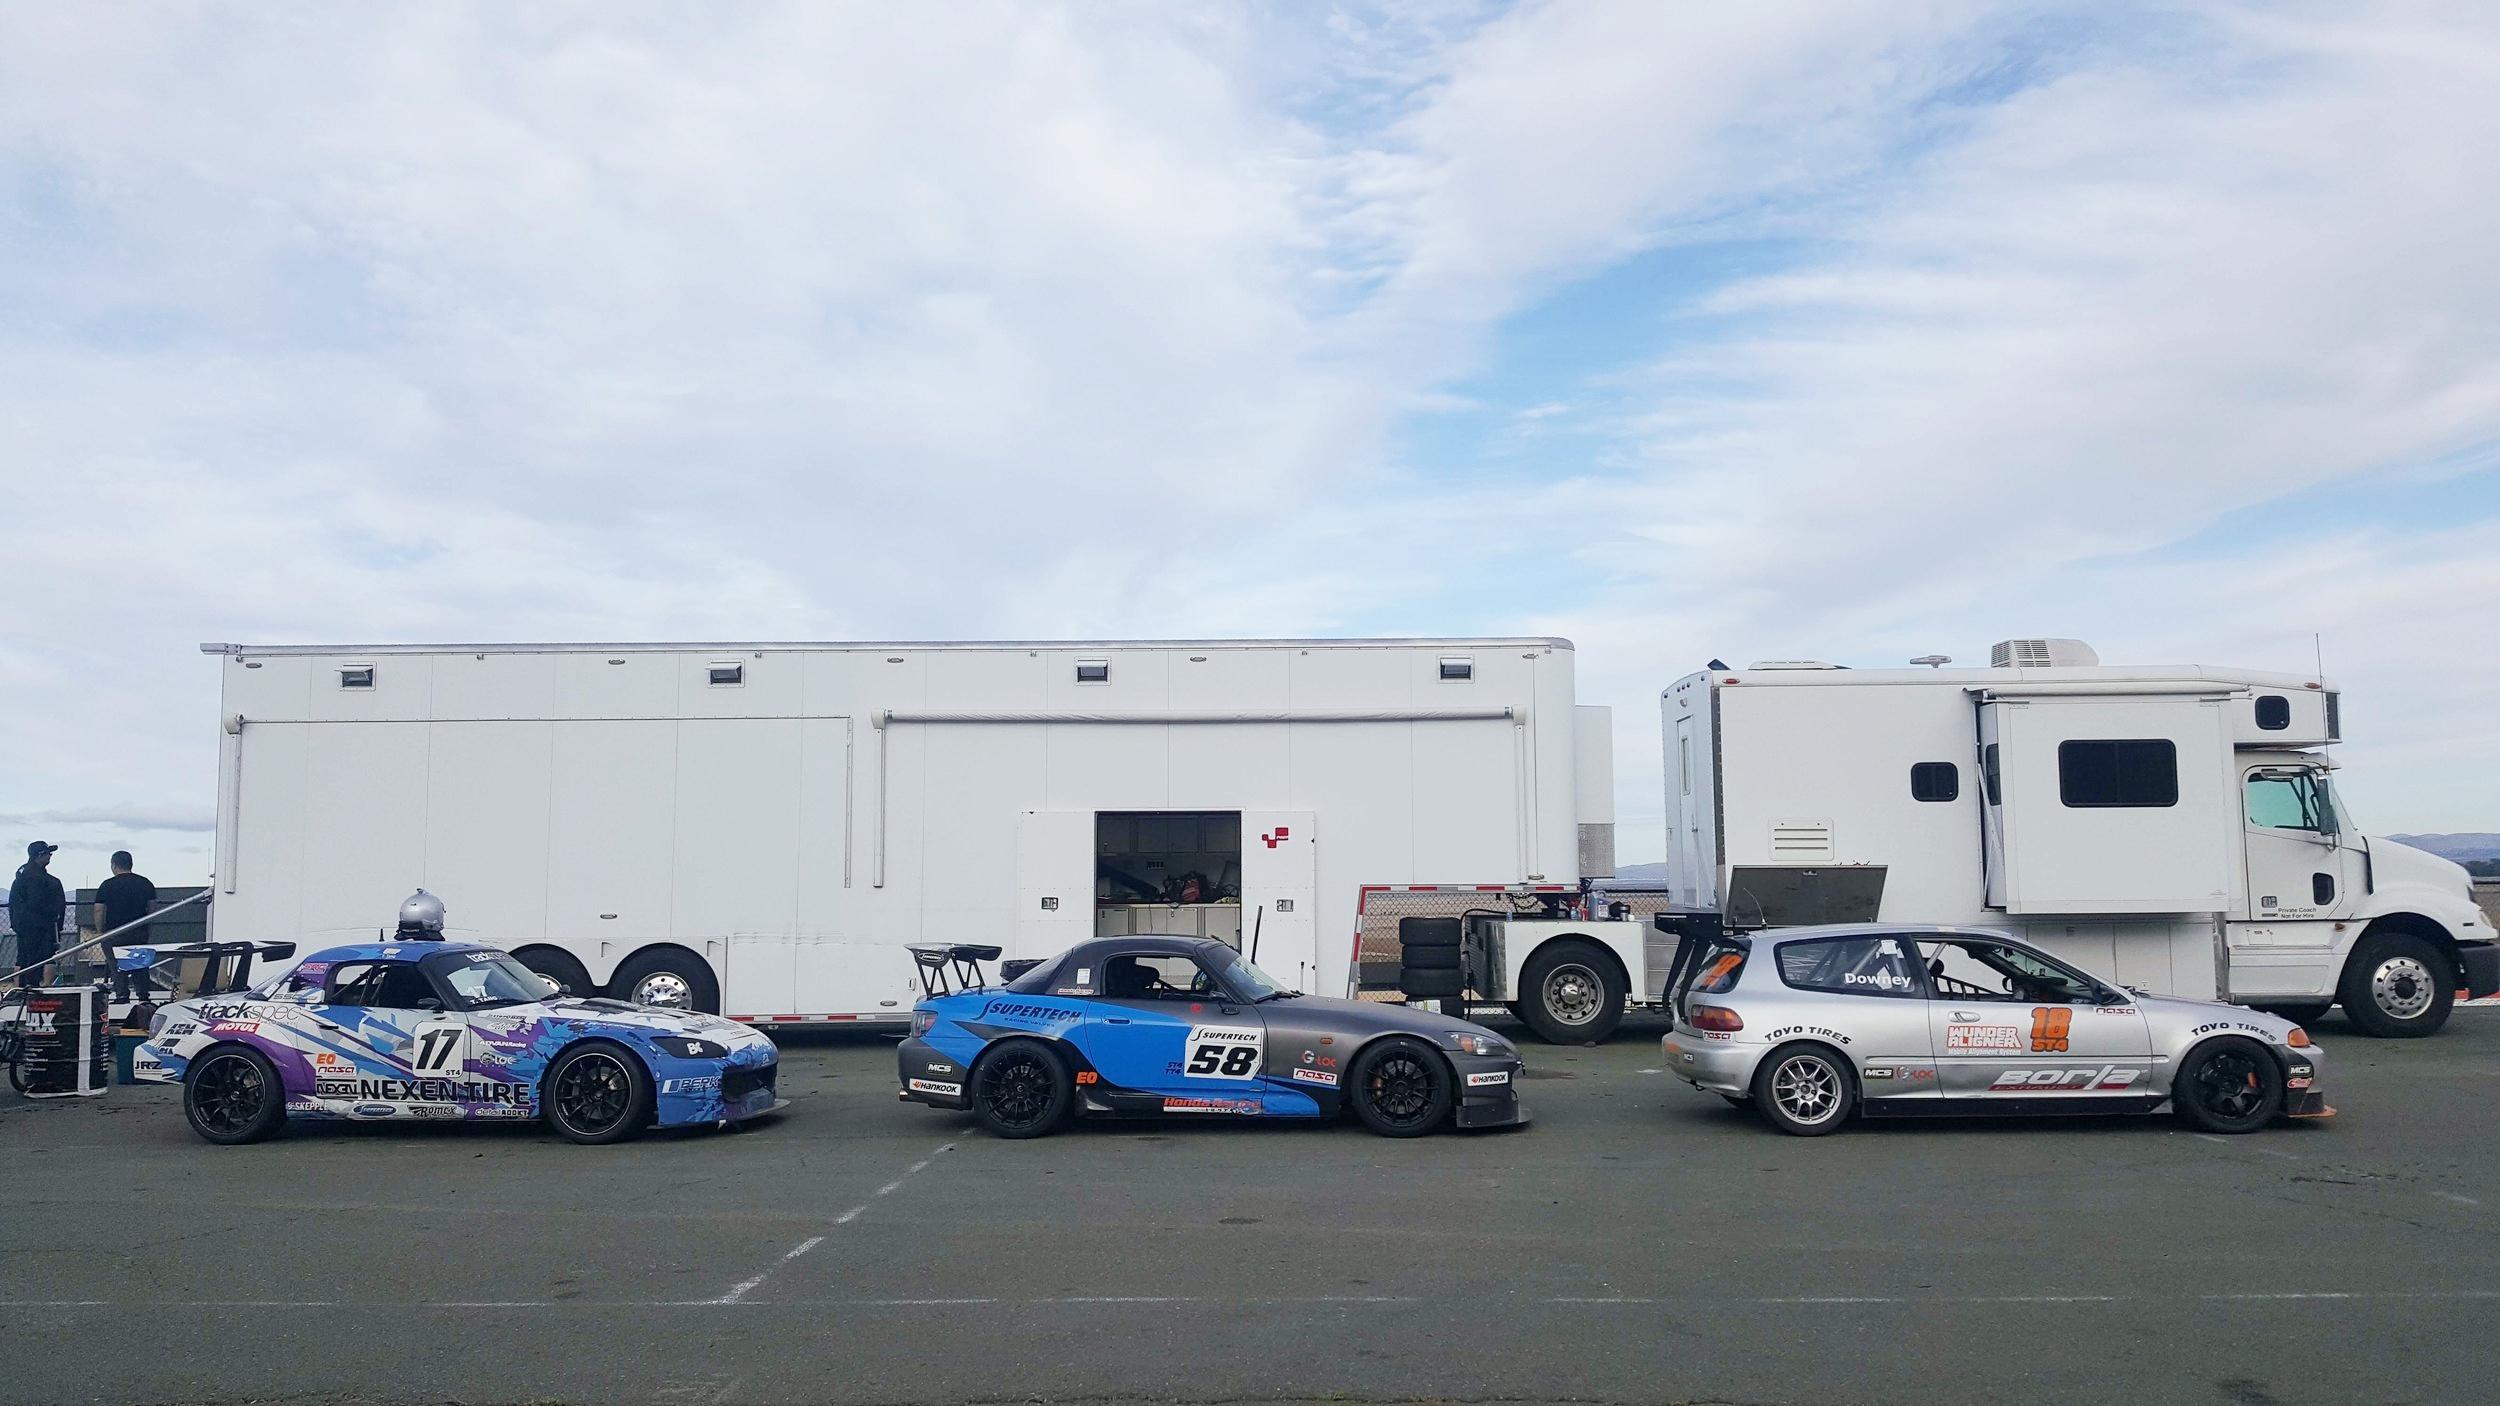 NASA ST4 Sonoma Raceway